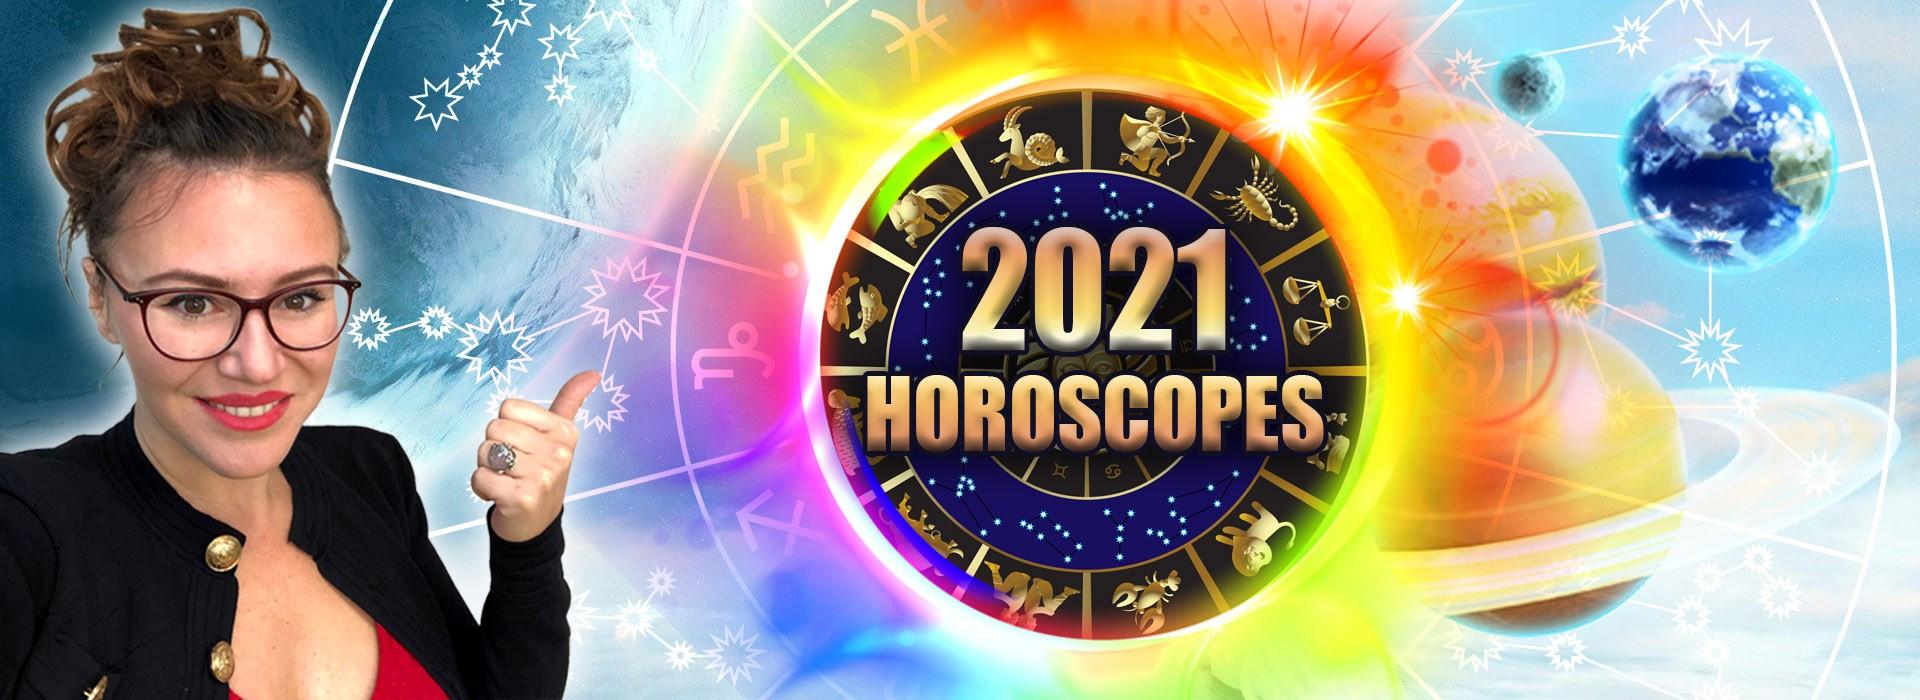 2021 Extensive Horoscopes